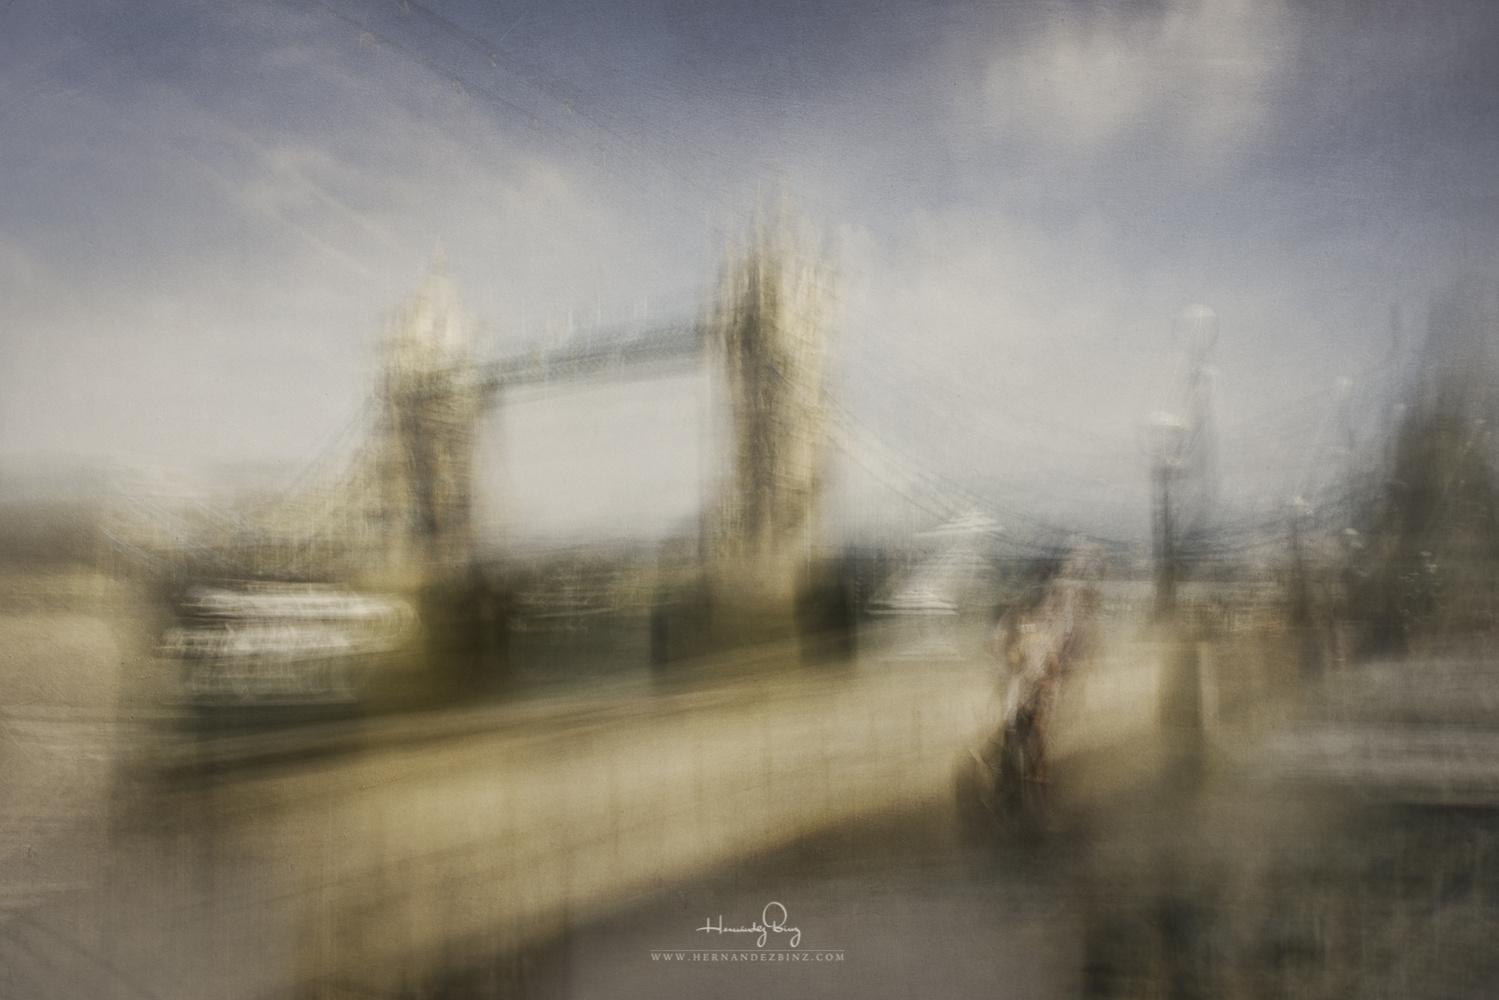 Untitled 5 by Adrian Hernandez Binz